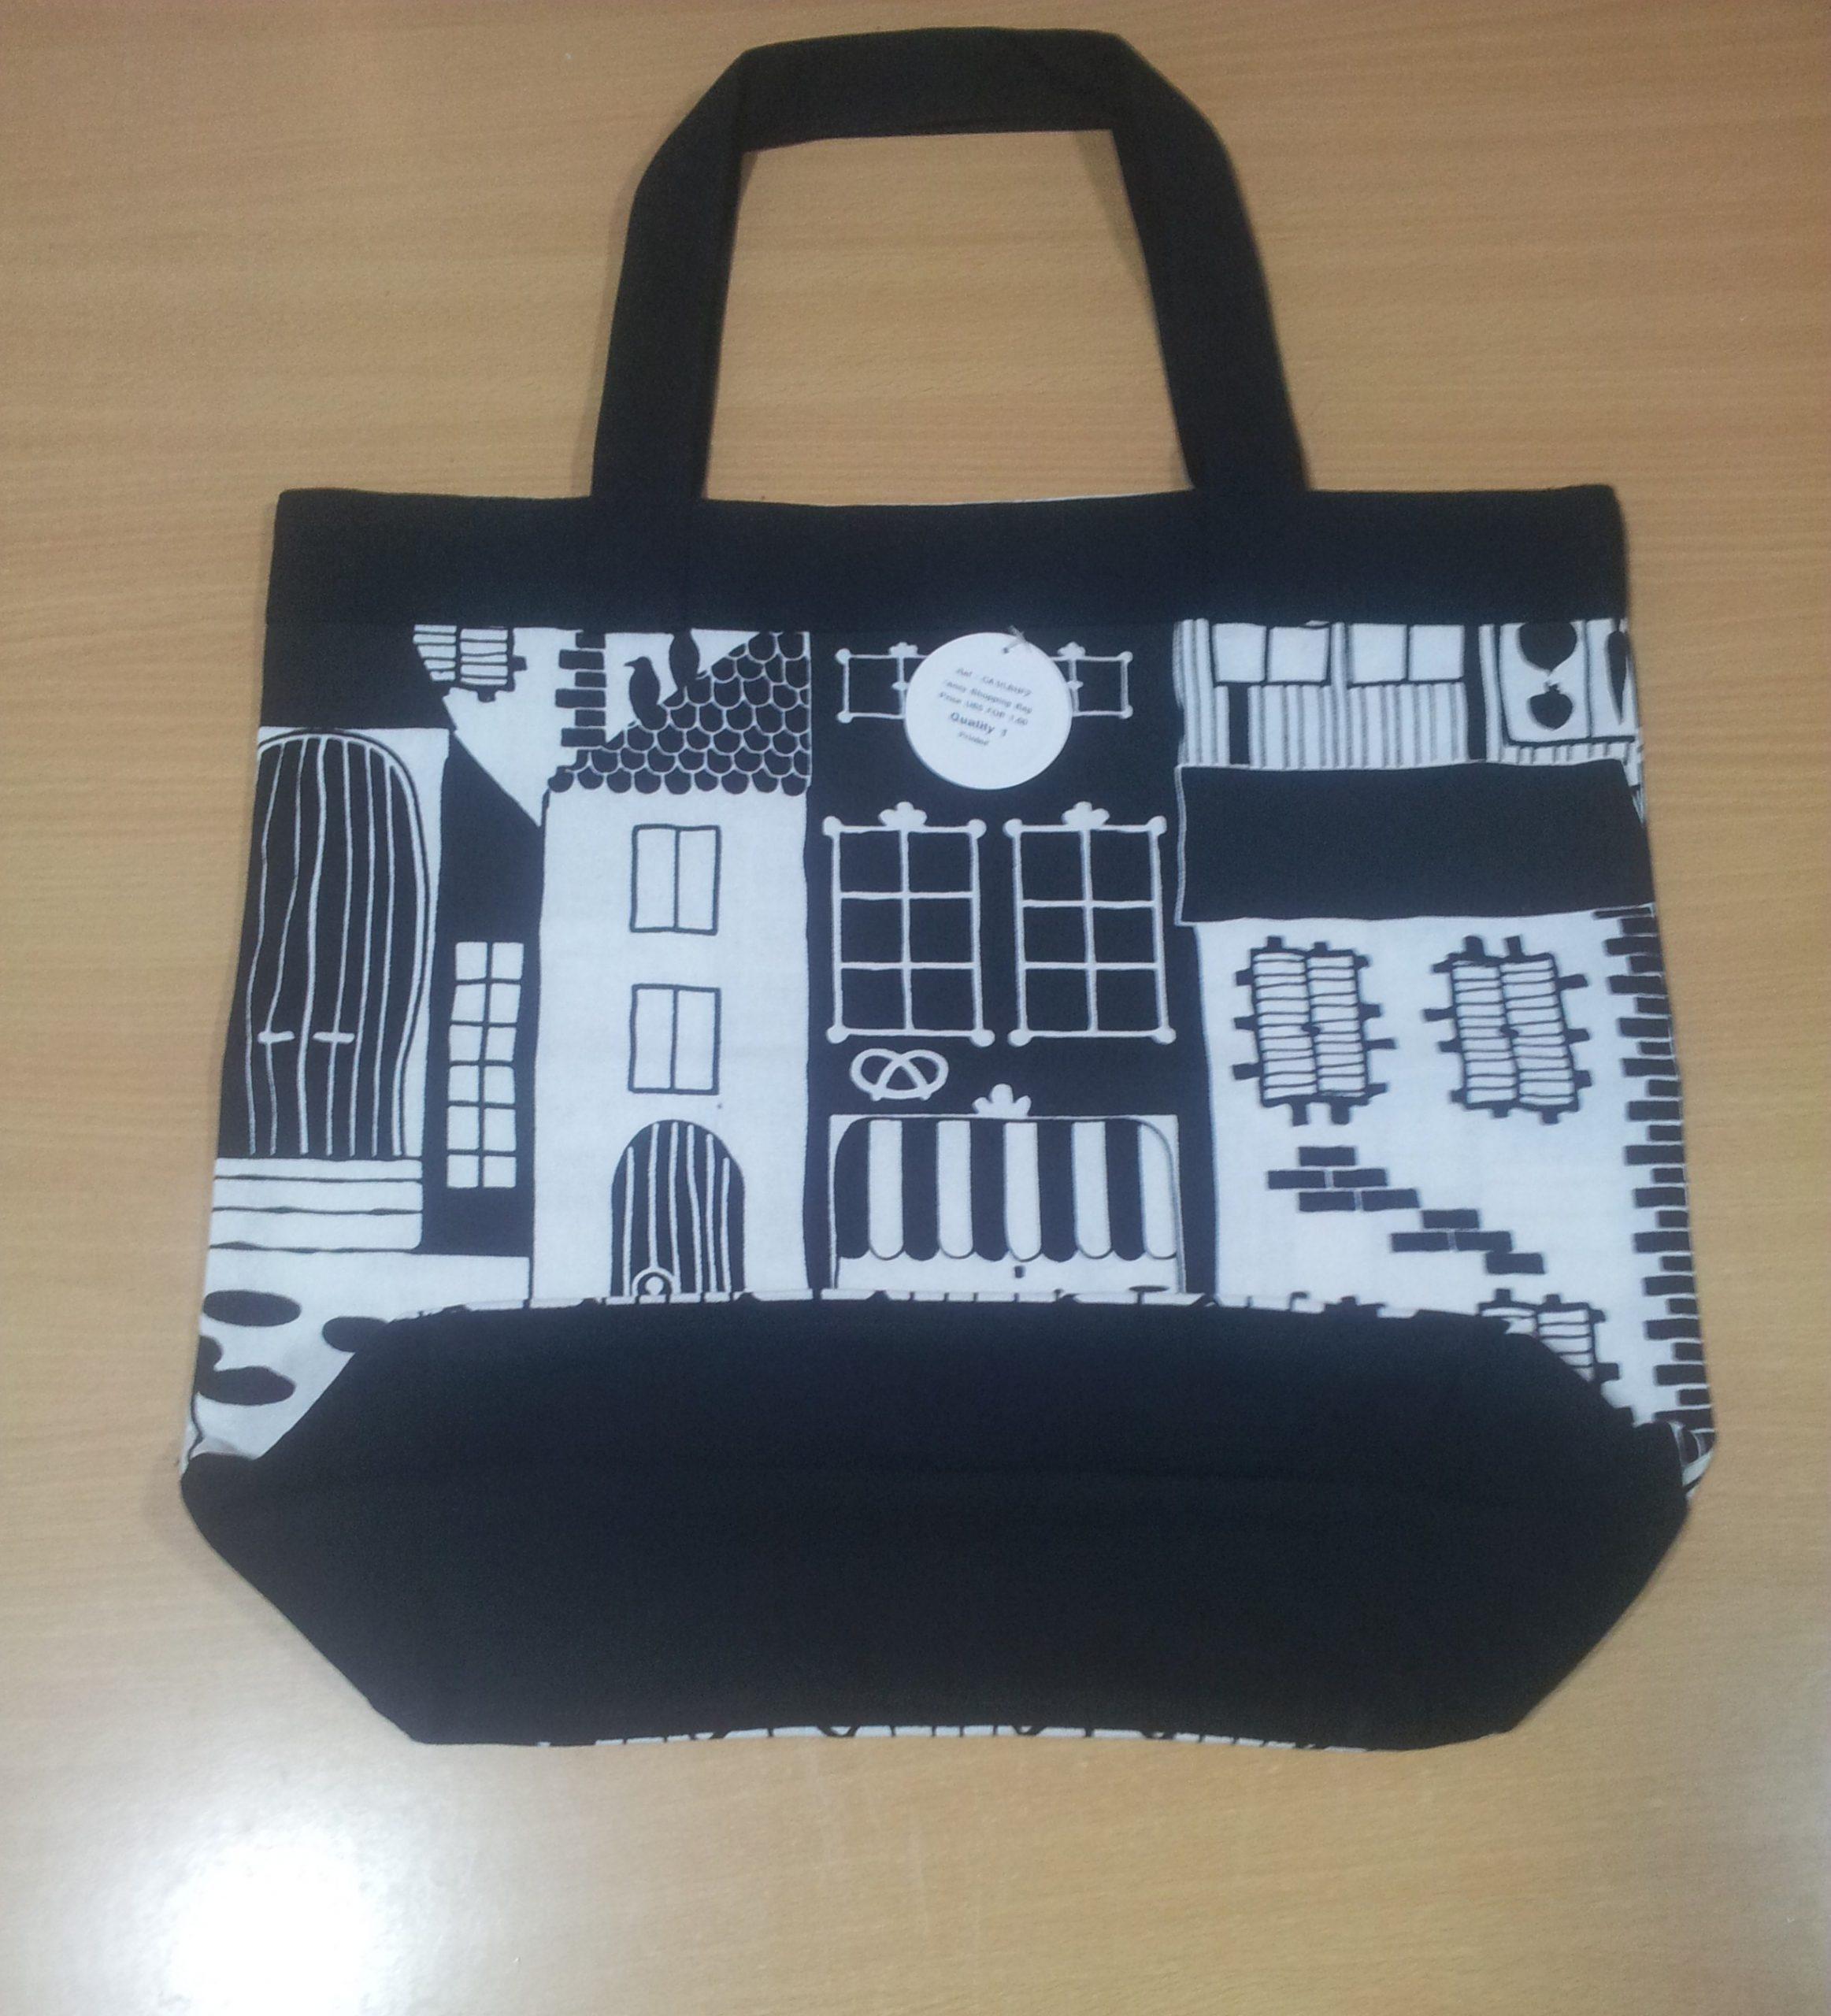 fancy shopping bags in 3 qualities